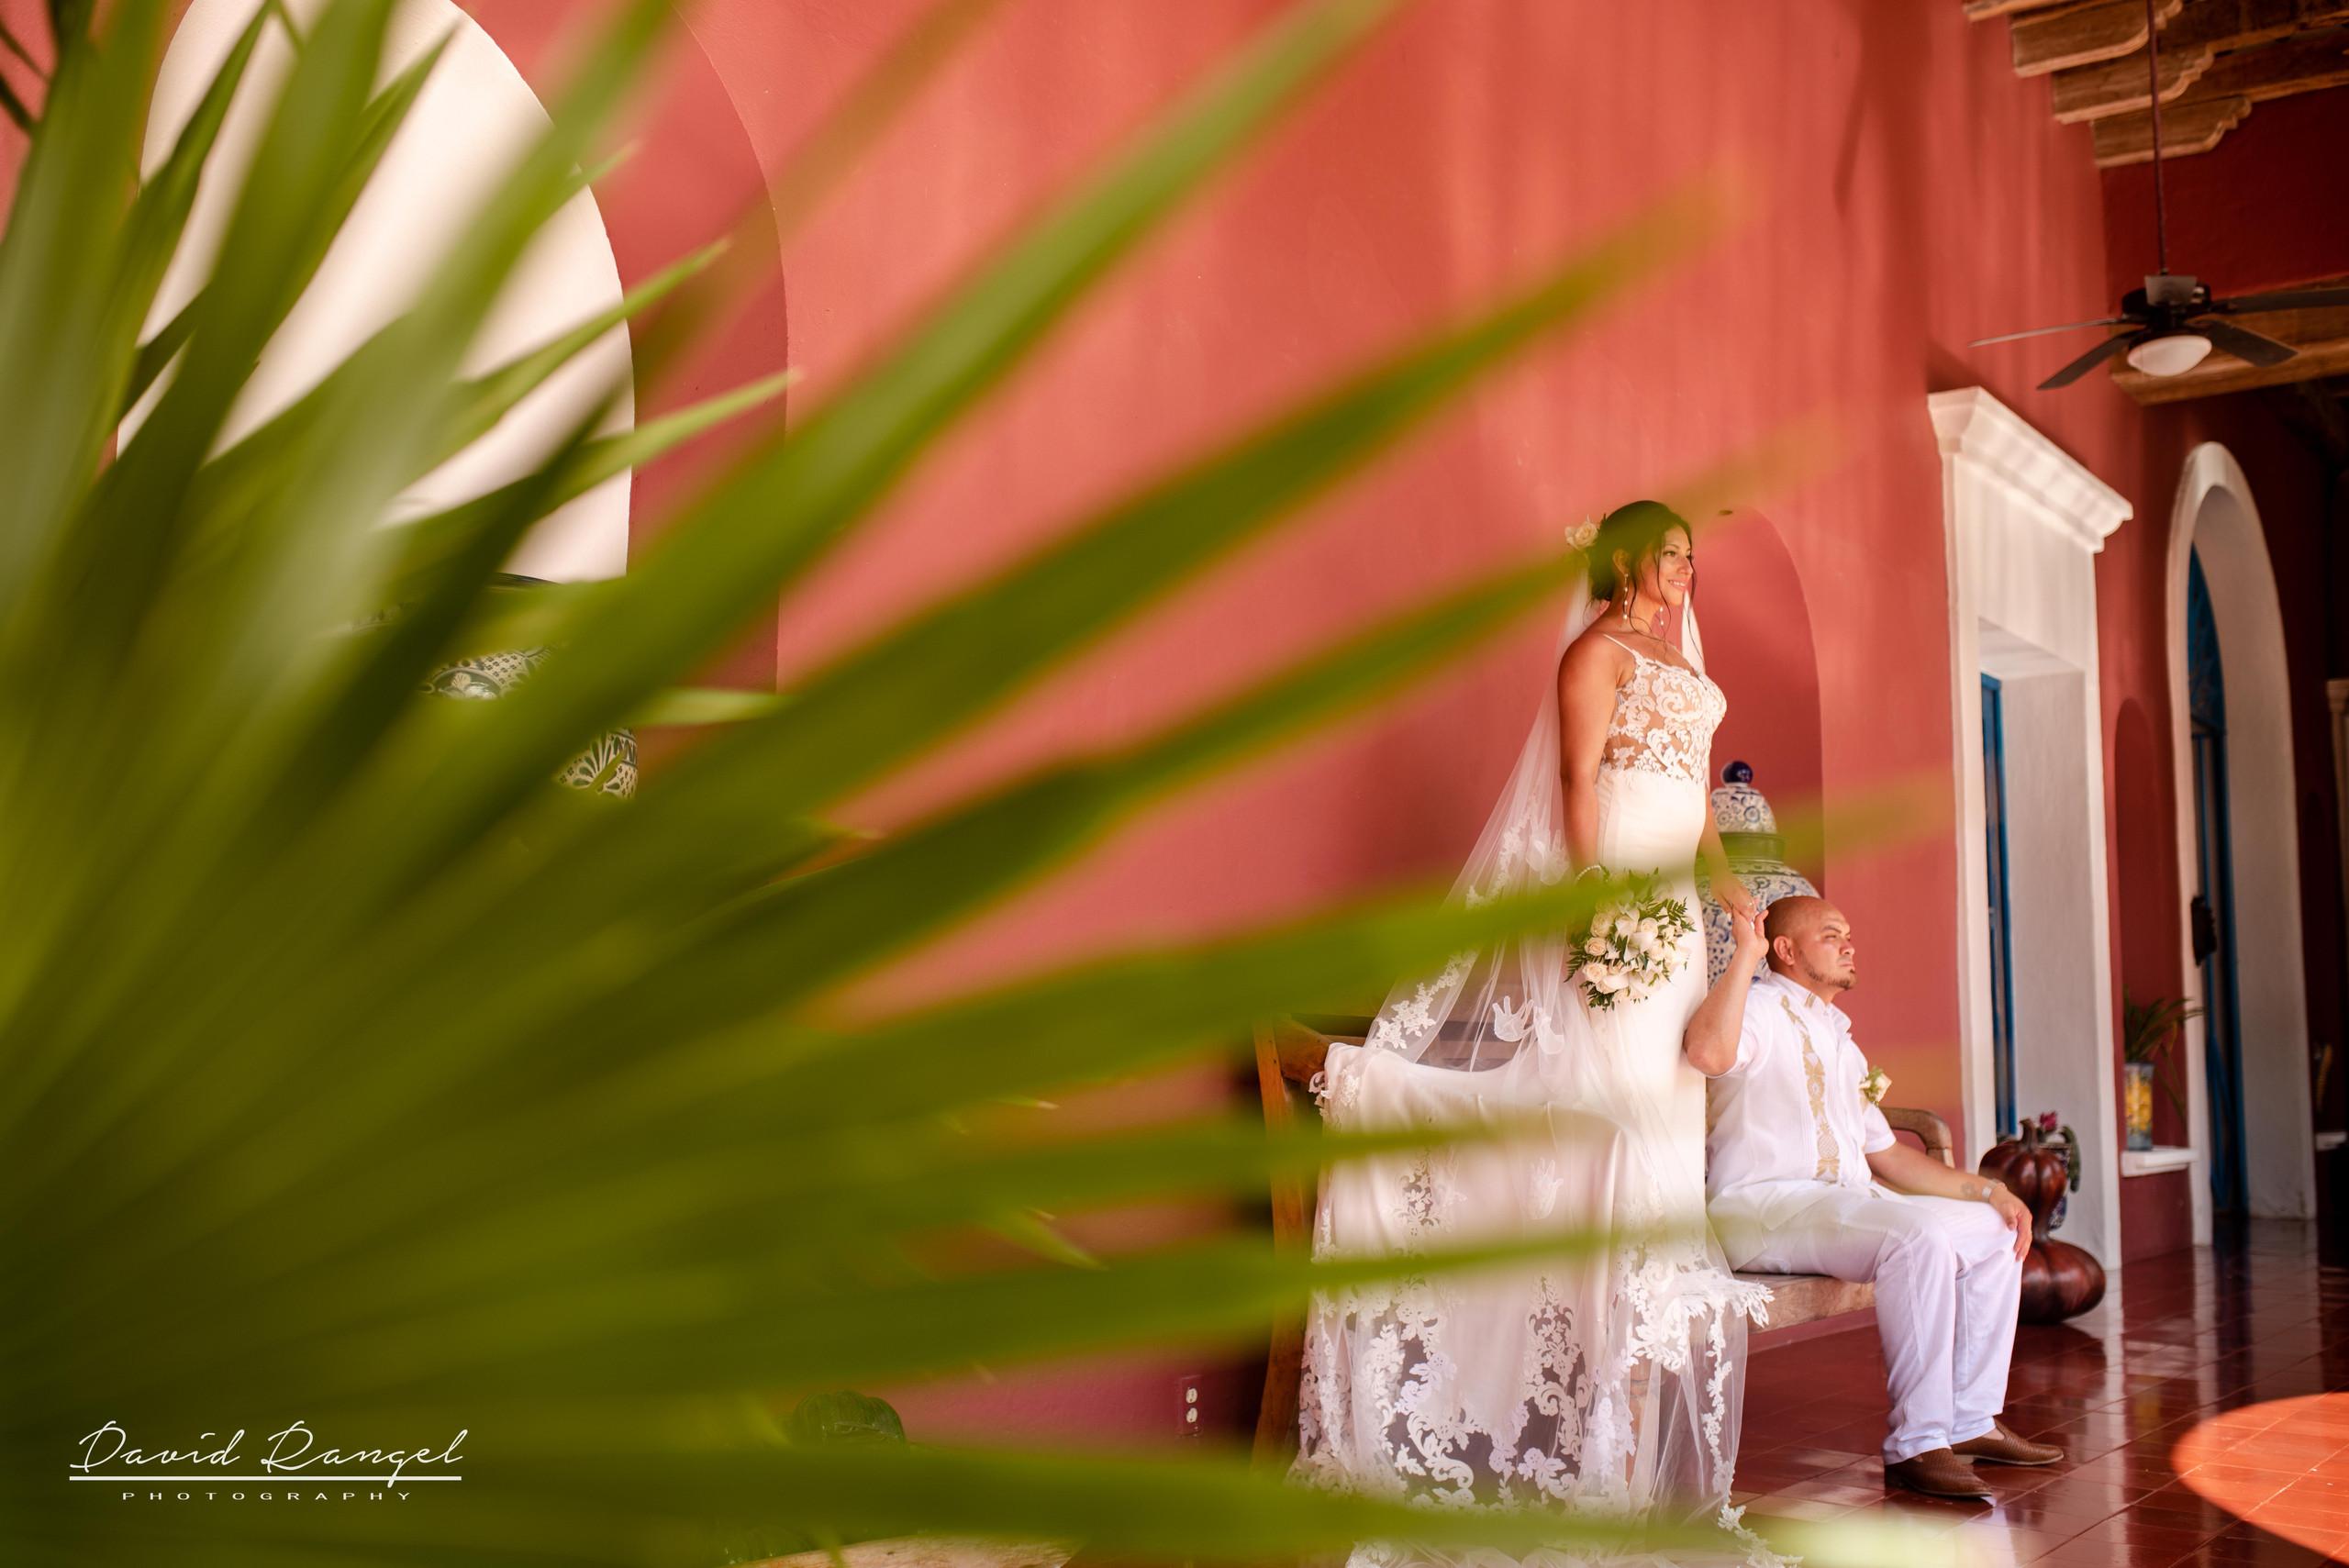 bride+groom+couple+photo+hacienda+xcaret+park+wedding+photosession